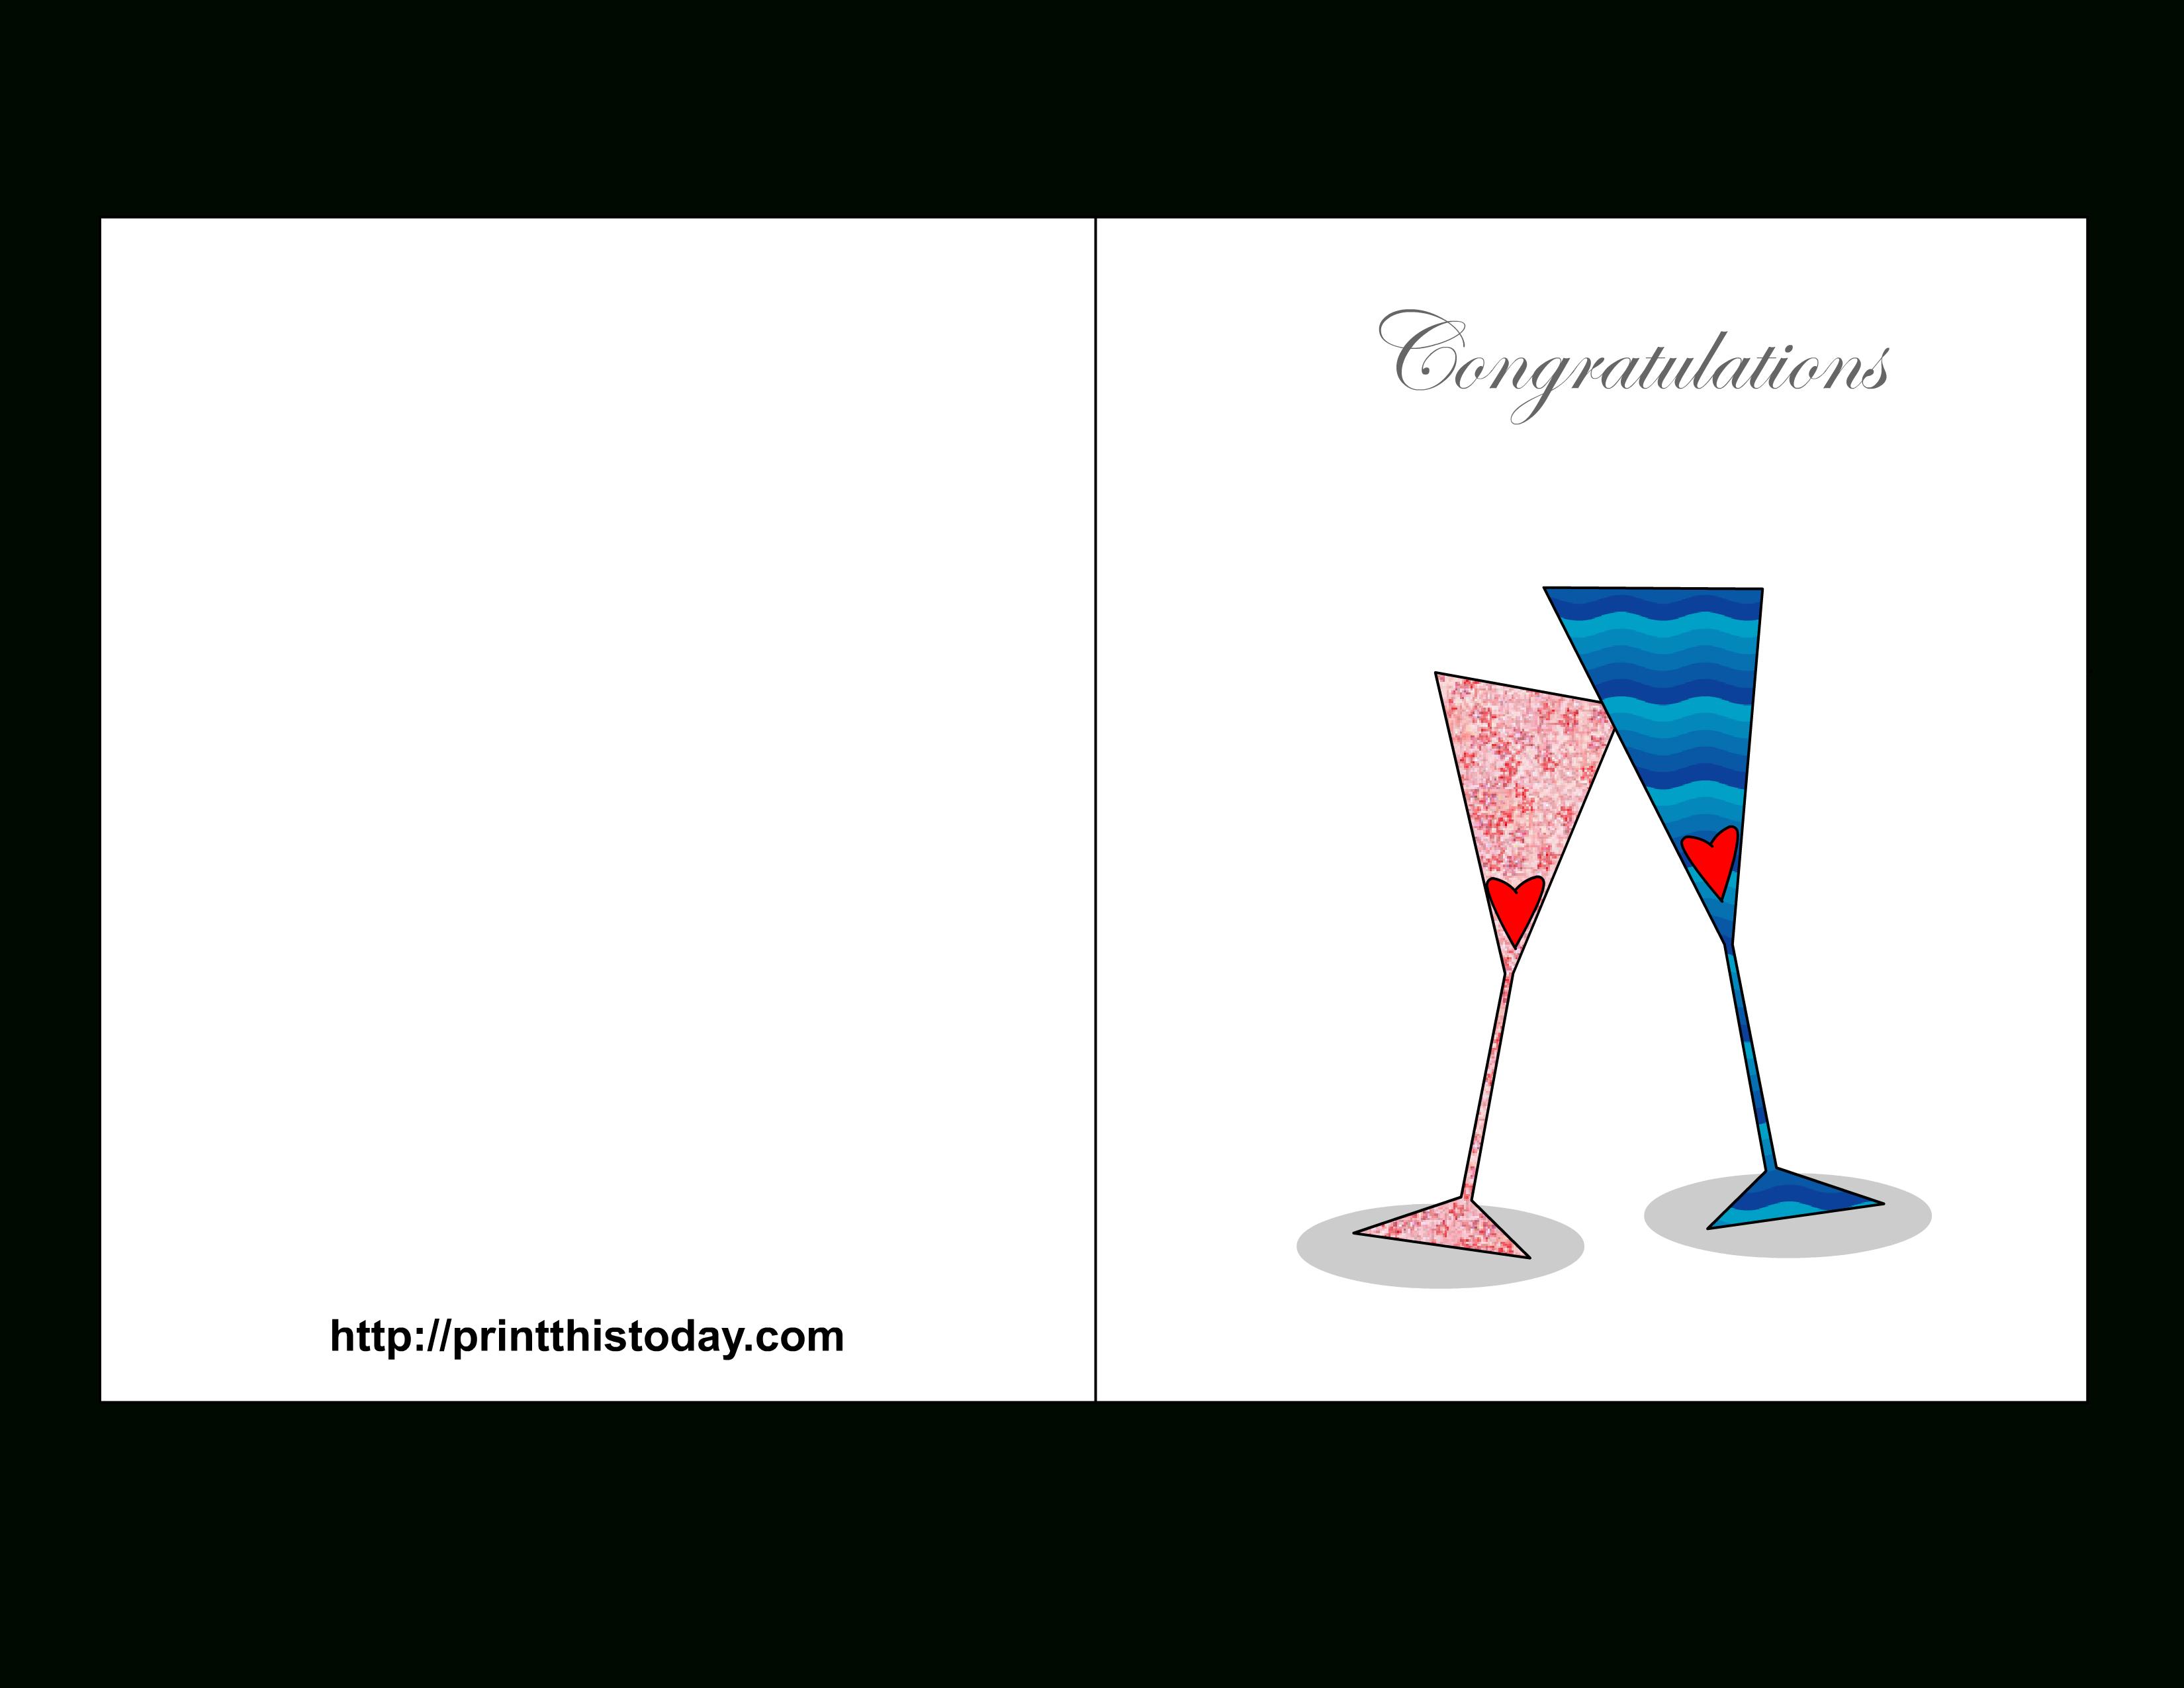 Free Printable Wedding Congratulations Cards - Wedding Wish Cards Printable Free